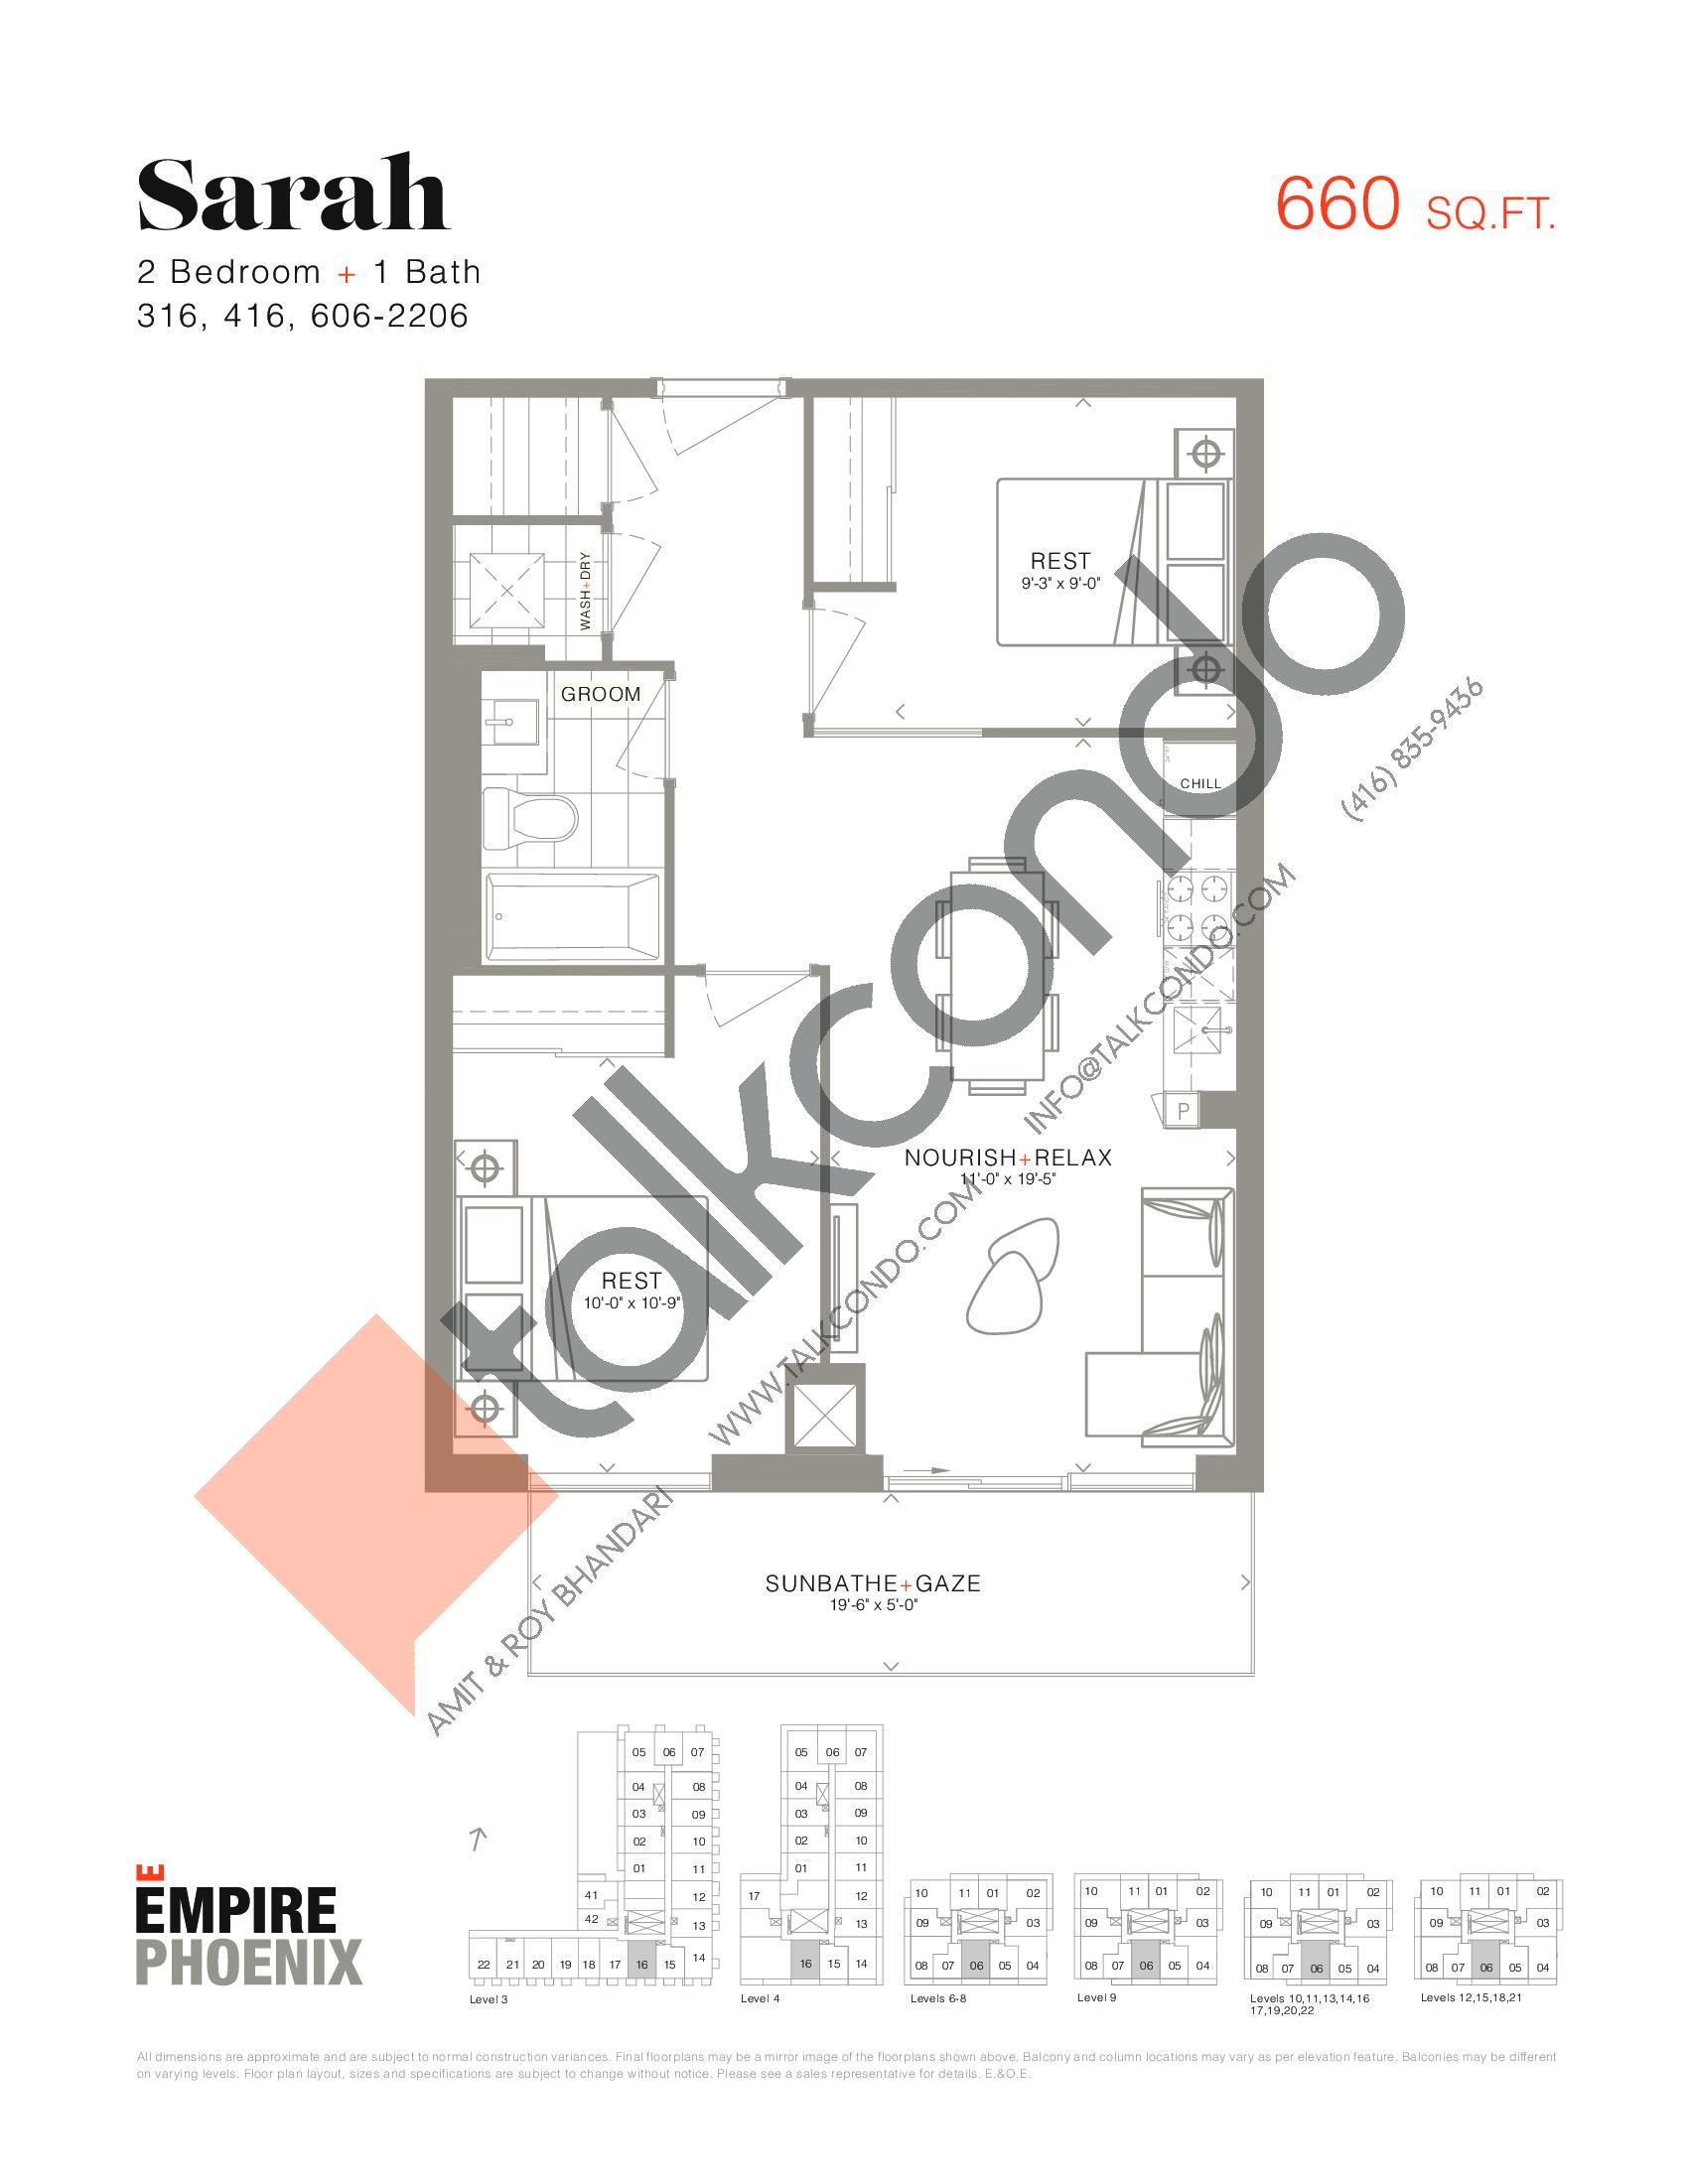 Sarah Floor Plan at Empire Phoenix Condos - 660 sq.ft